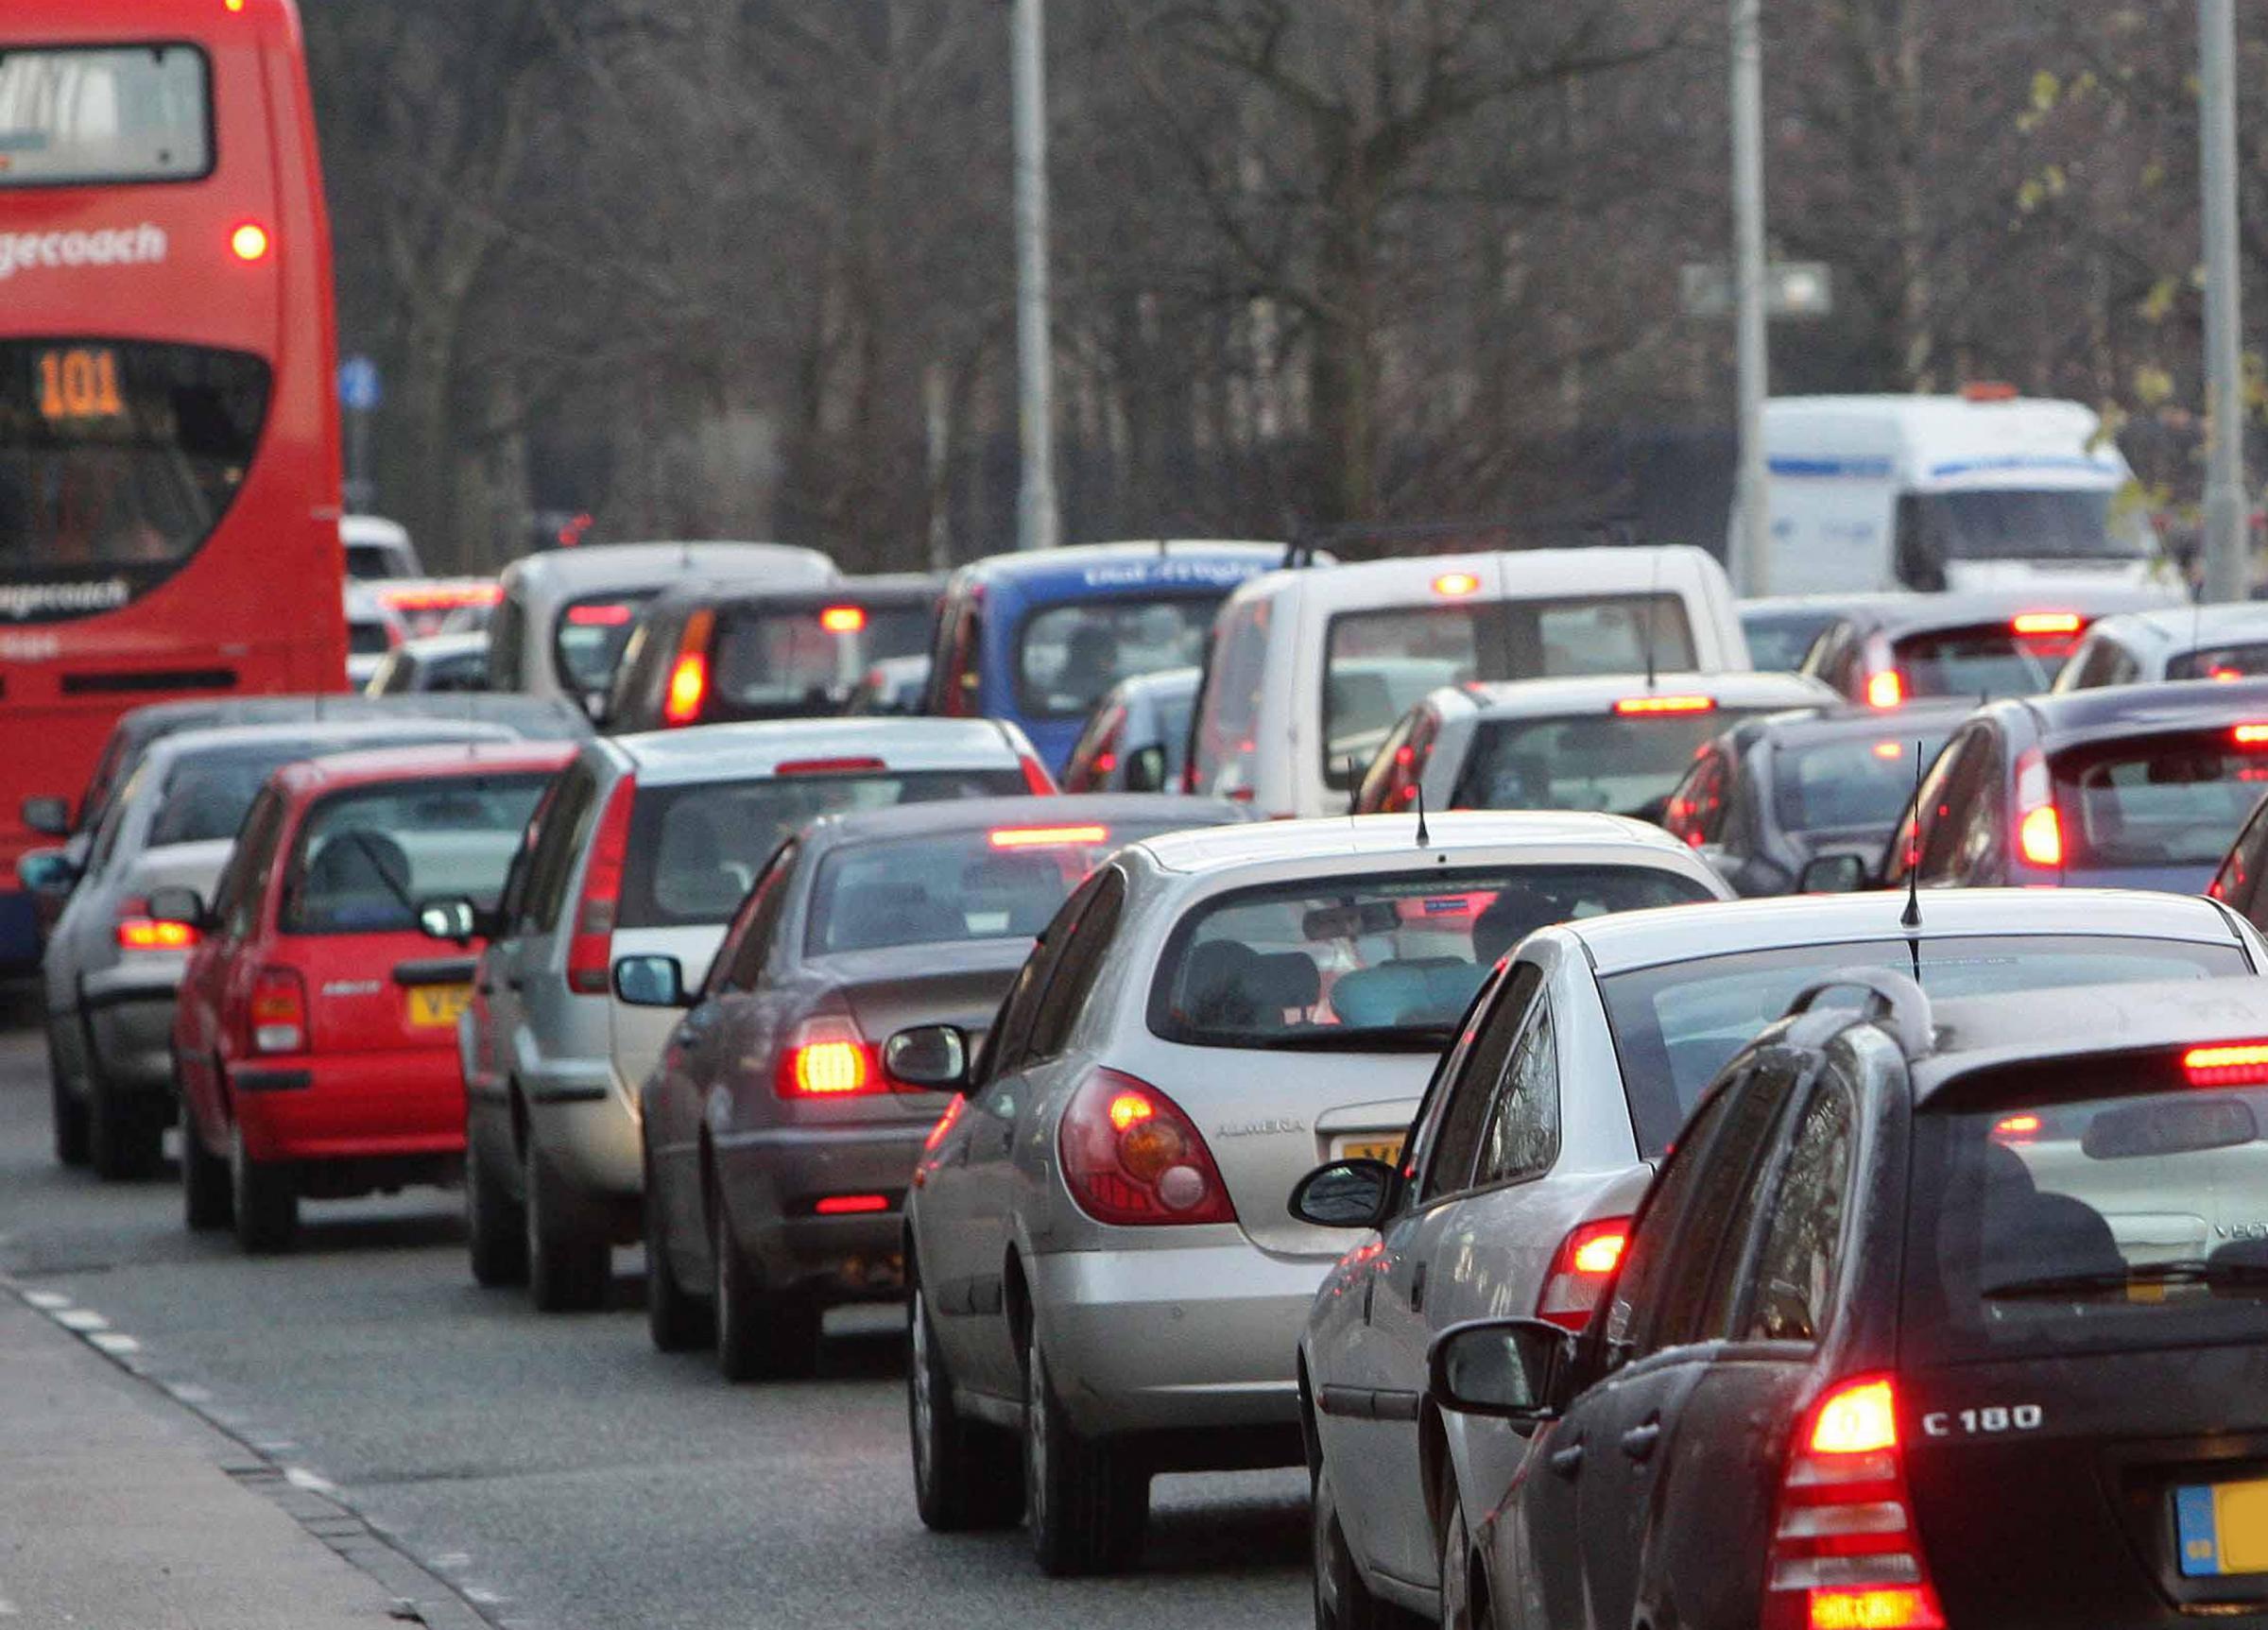 Traffic update from Swindon's roads on Wednesday morning